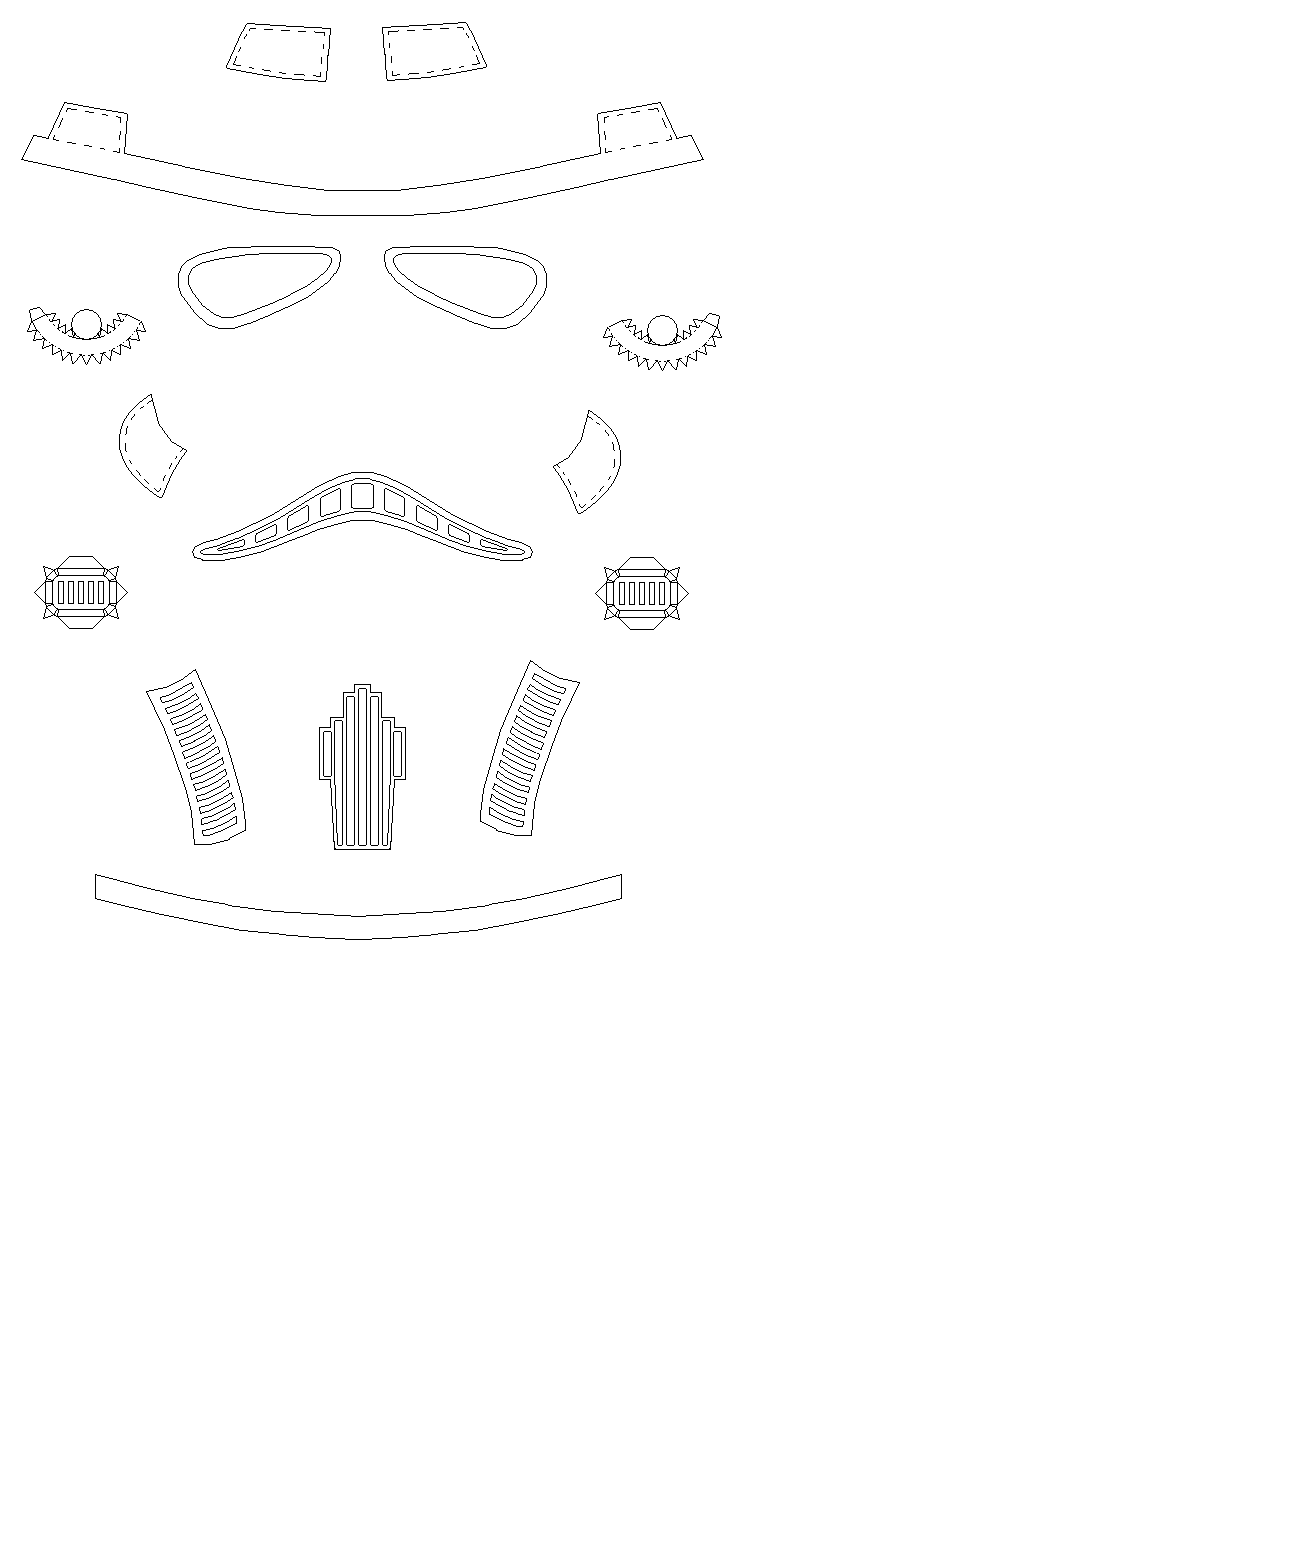 Stormtrooper (My version)   PaperBotz